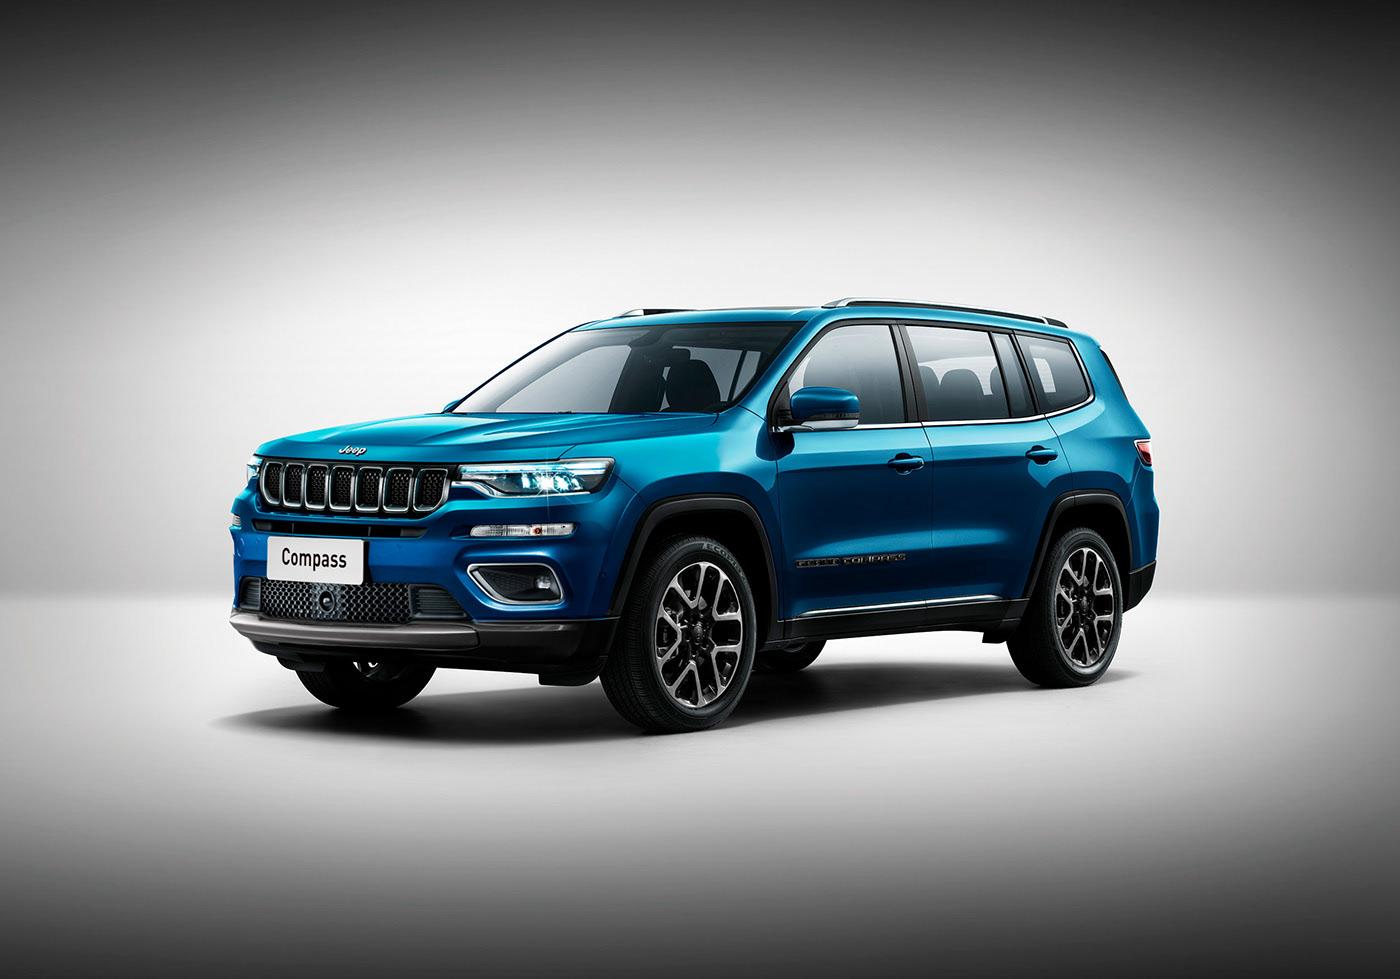 2022 jeep compass rendered, grand compass three-row suv